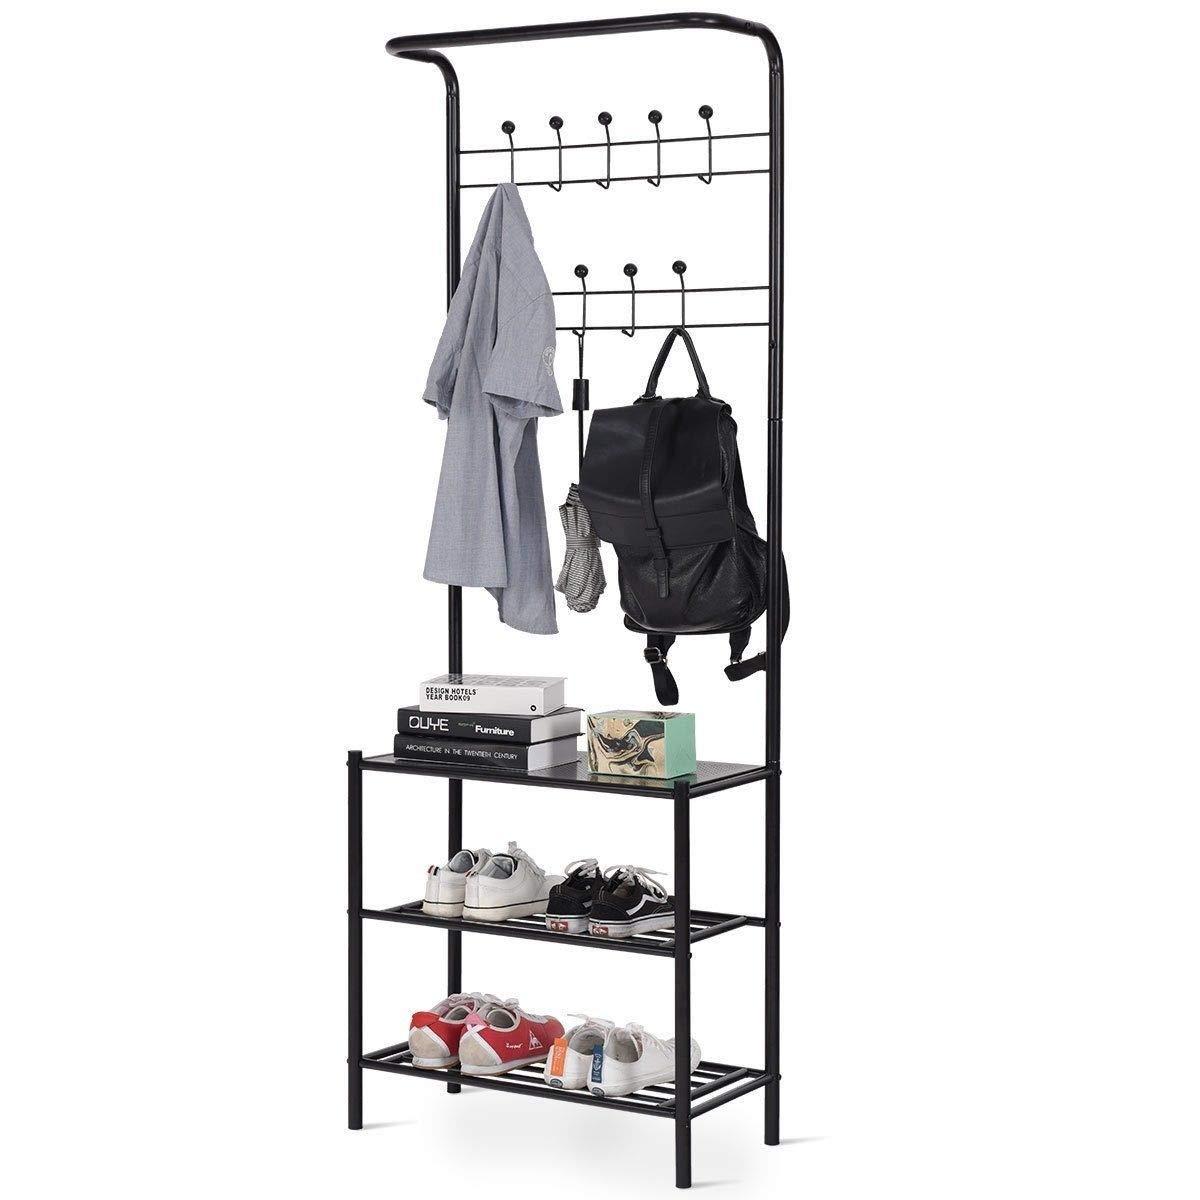 Black 18 Hooks Metal Entryway Garment Rack w/ 3-Tier Shoes Rack (U.S. Stock)